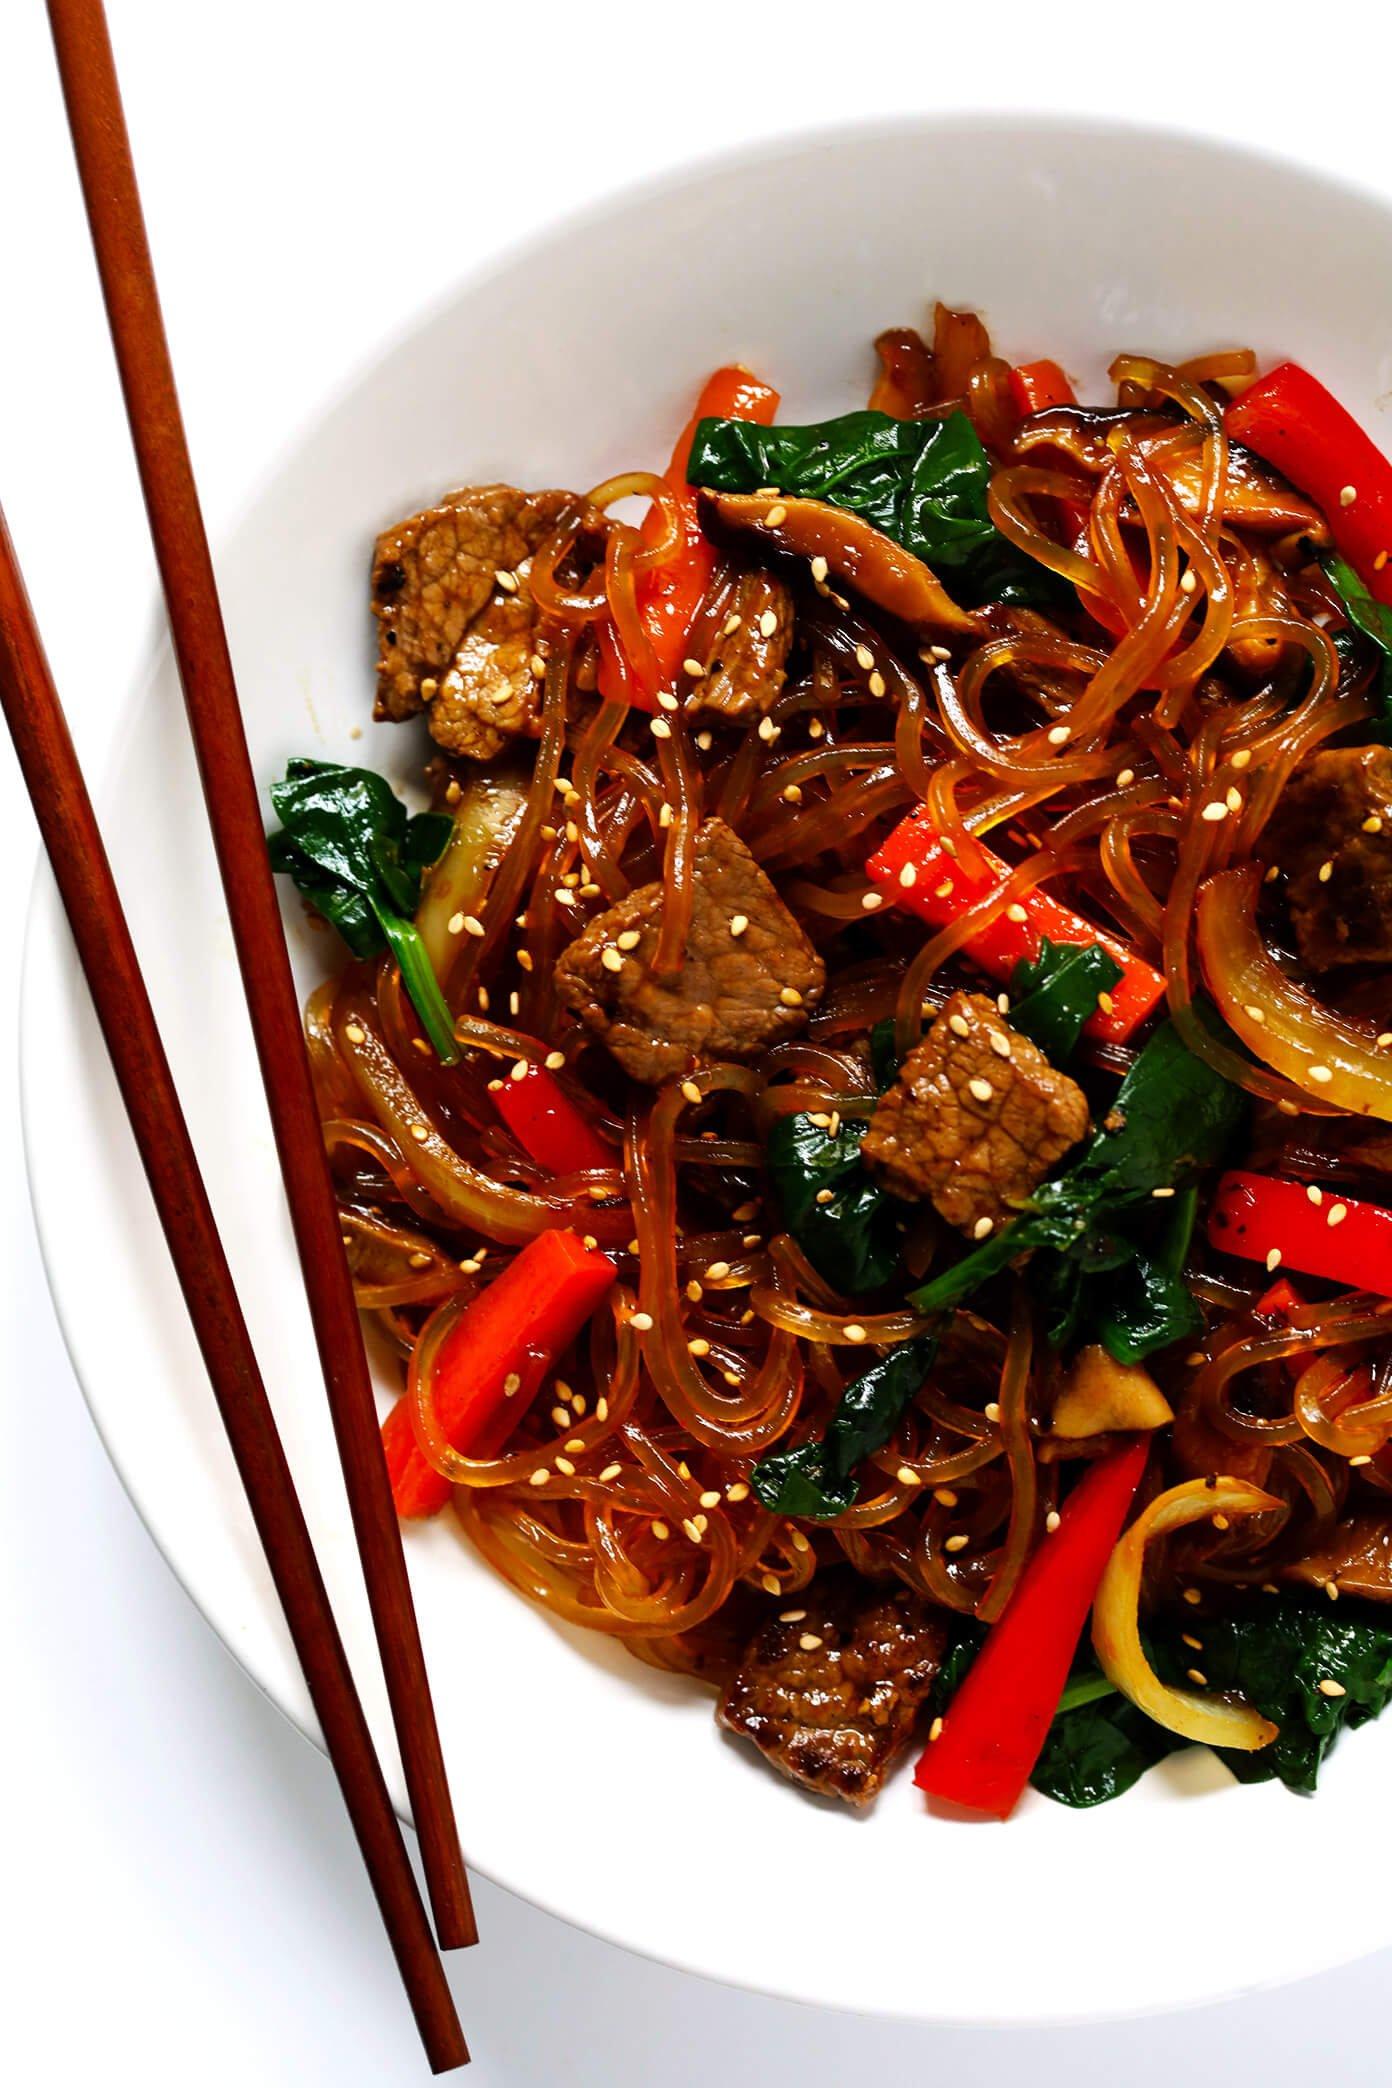 Japchae Korean Noodle Stir Fry with Chopsticks